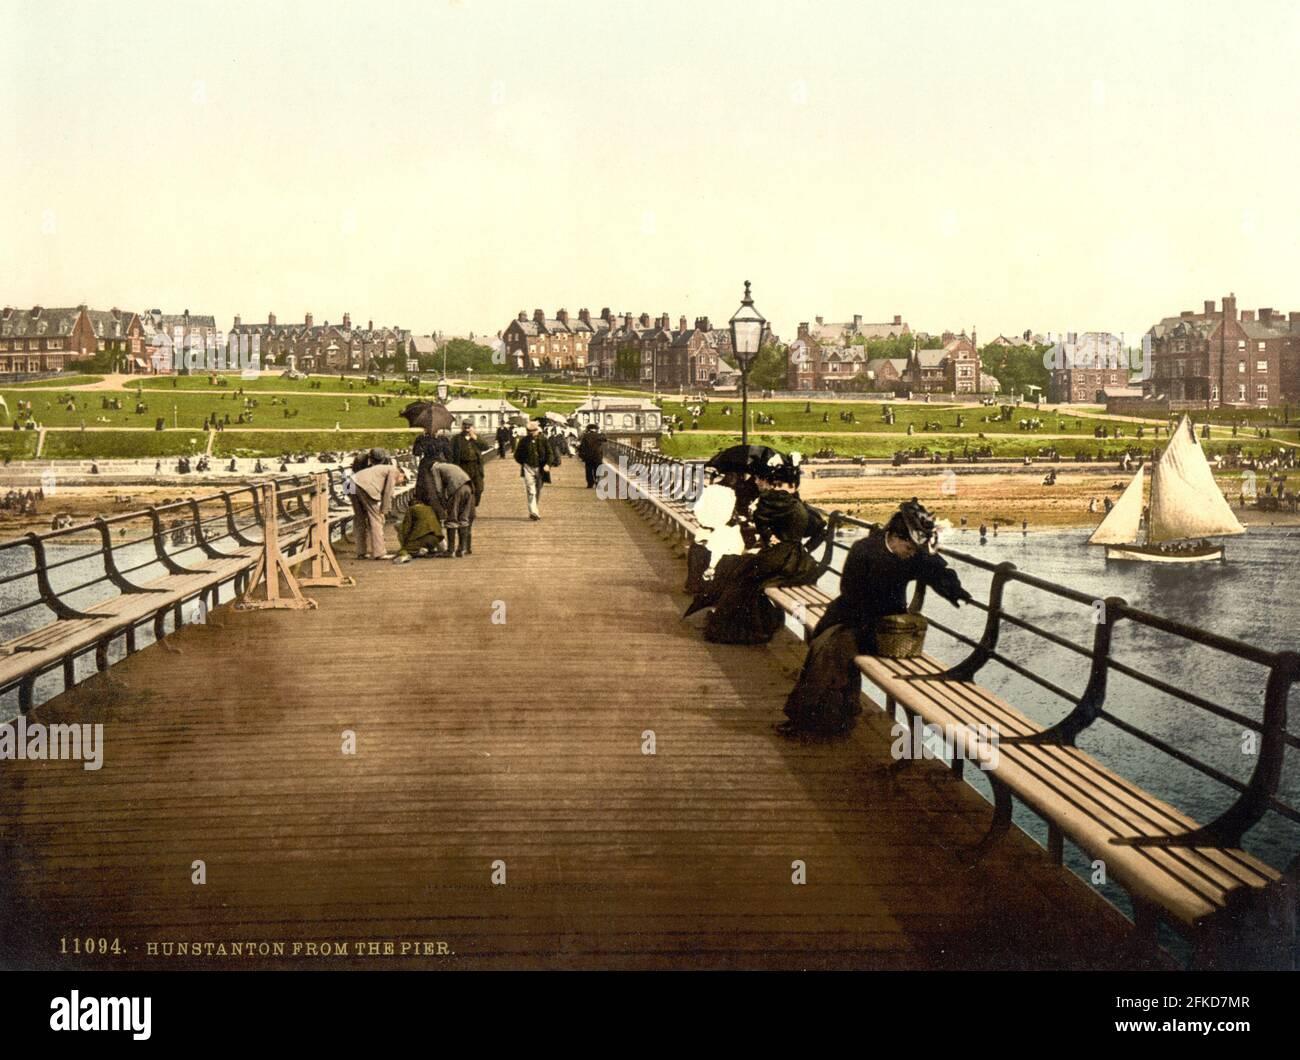 Hunstanton Pier, Norfolk vers 1890-1900 Banque D'Images